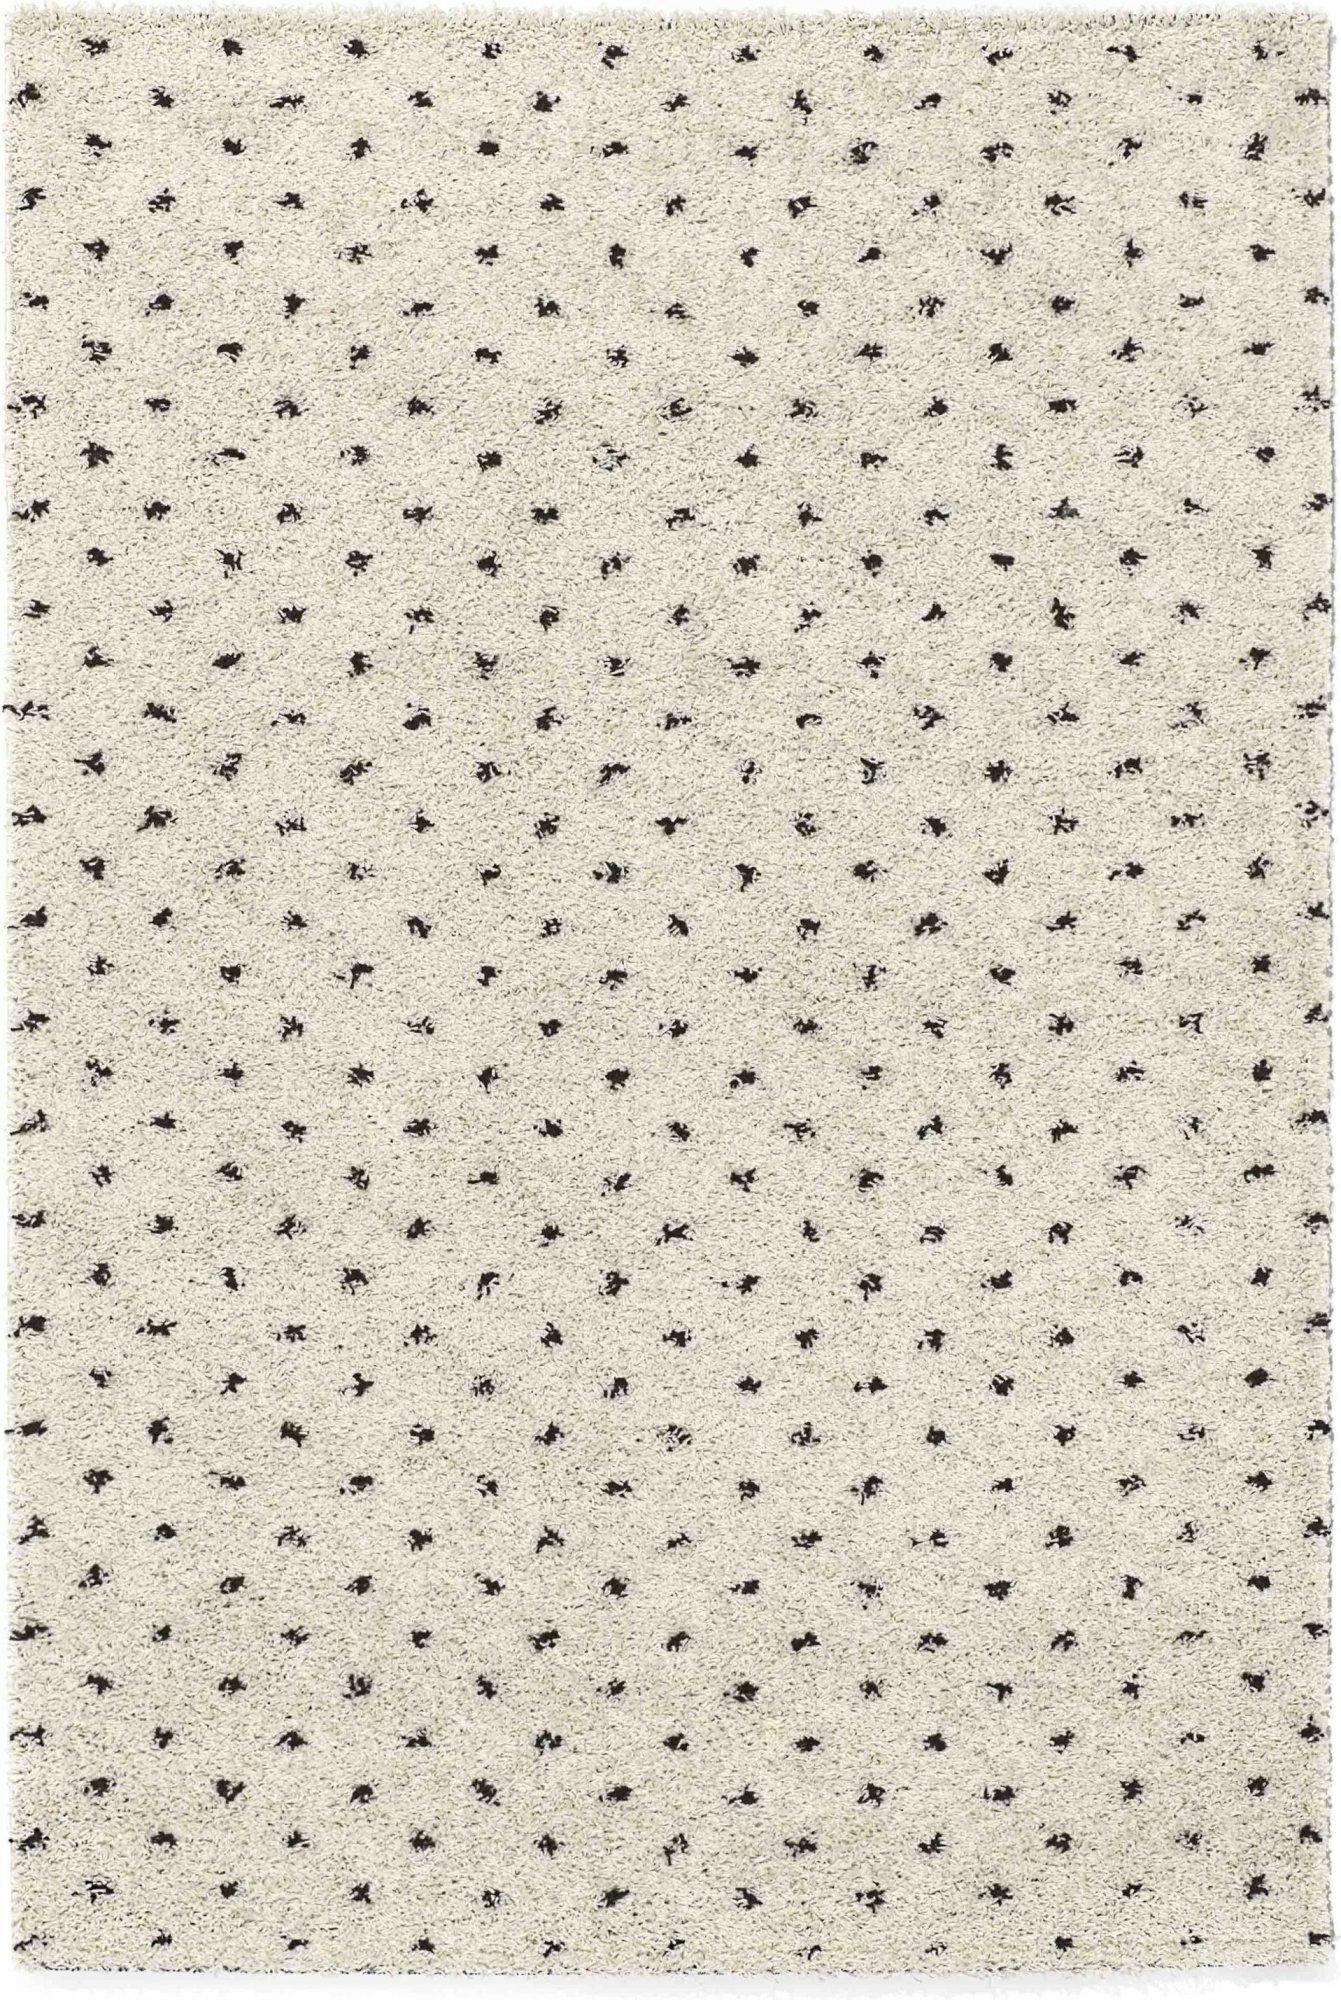 Tapis shaggy polypropylène beige 160x230